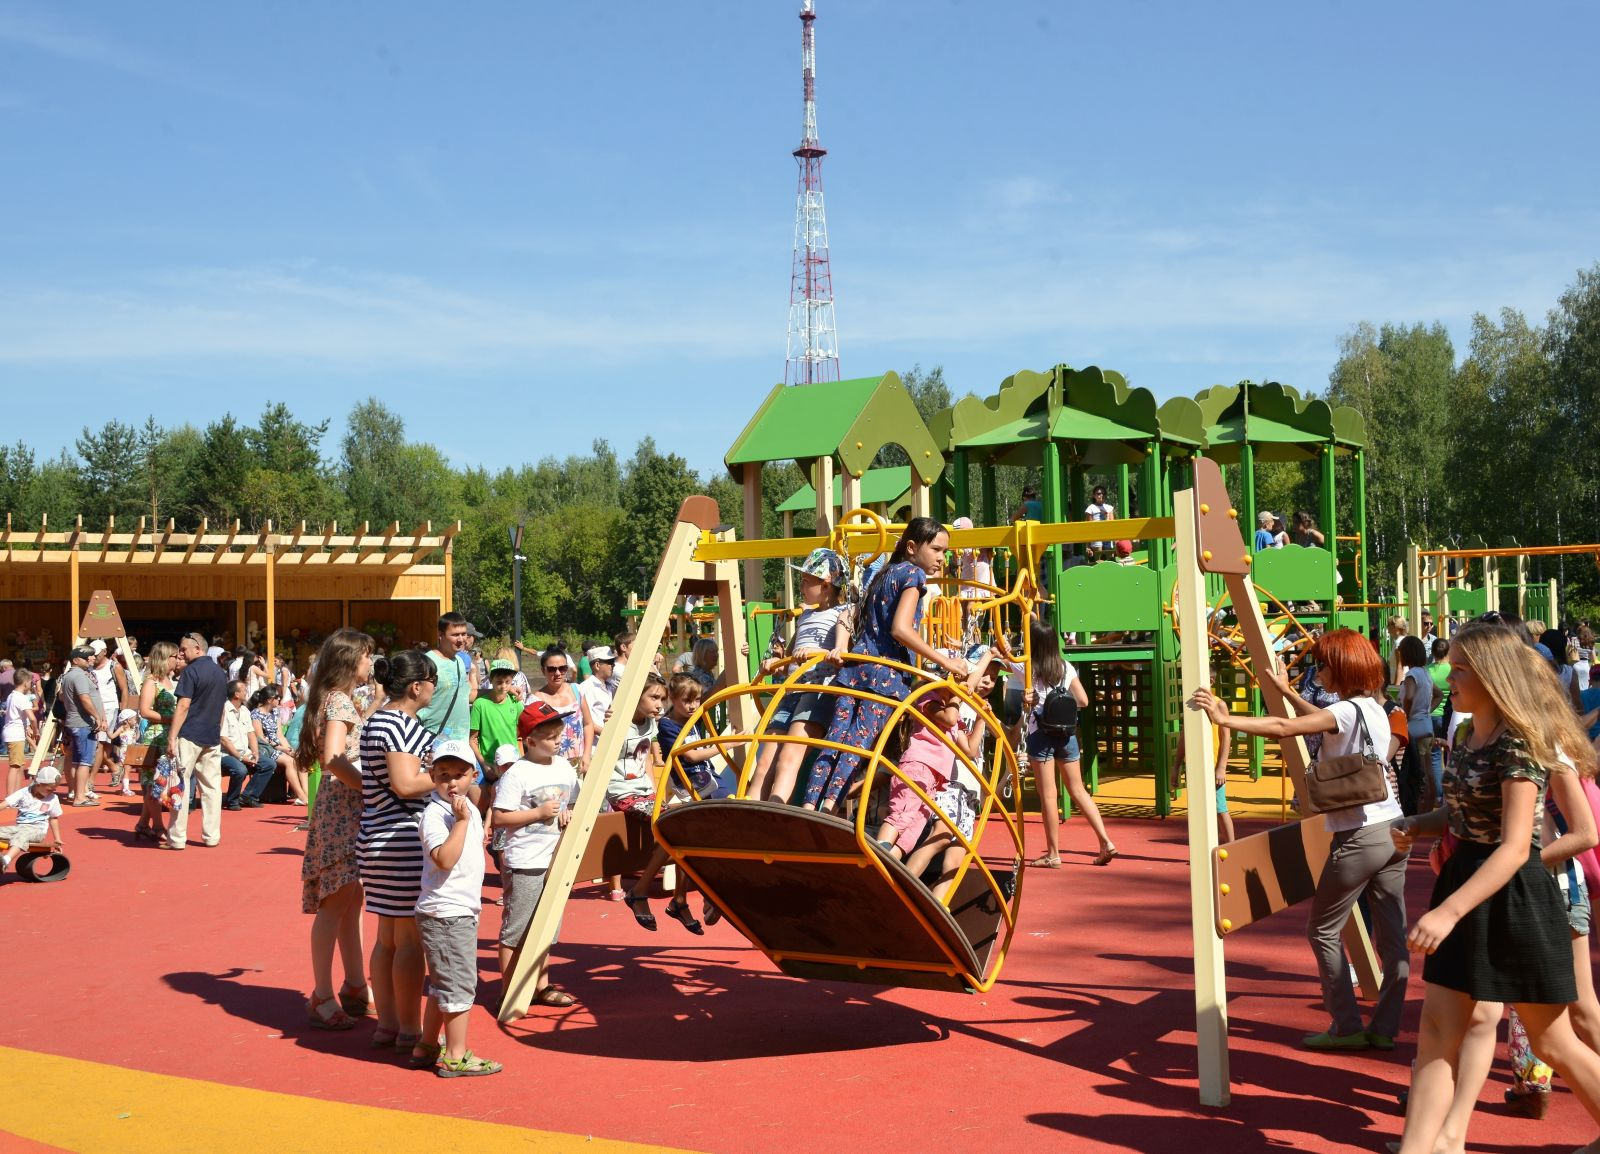 нижнекамск парк семья фото